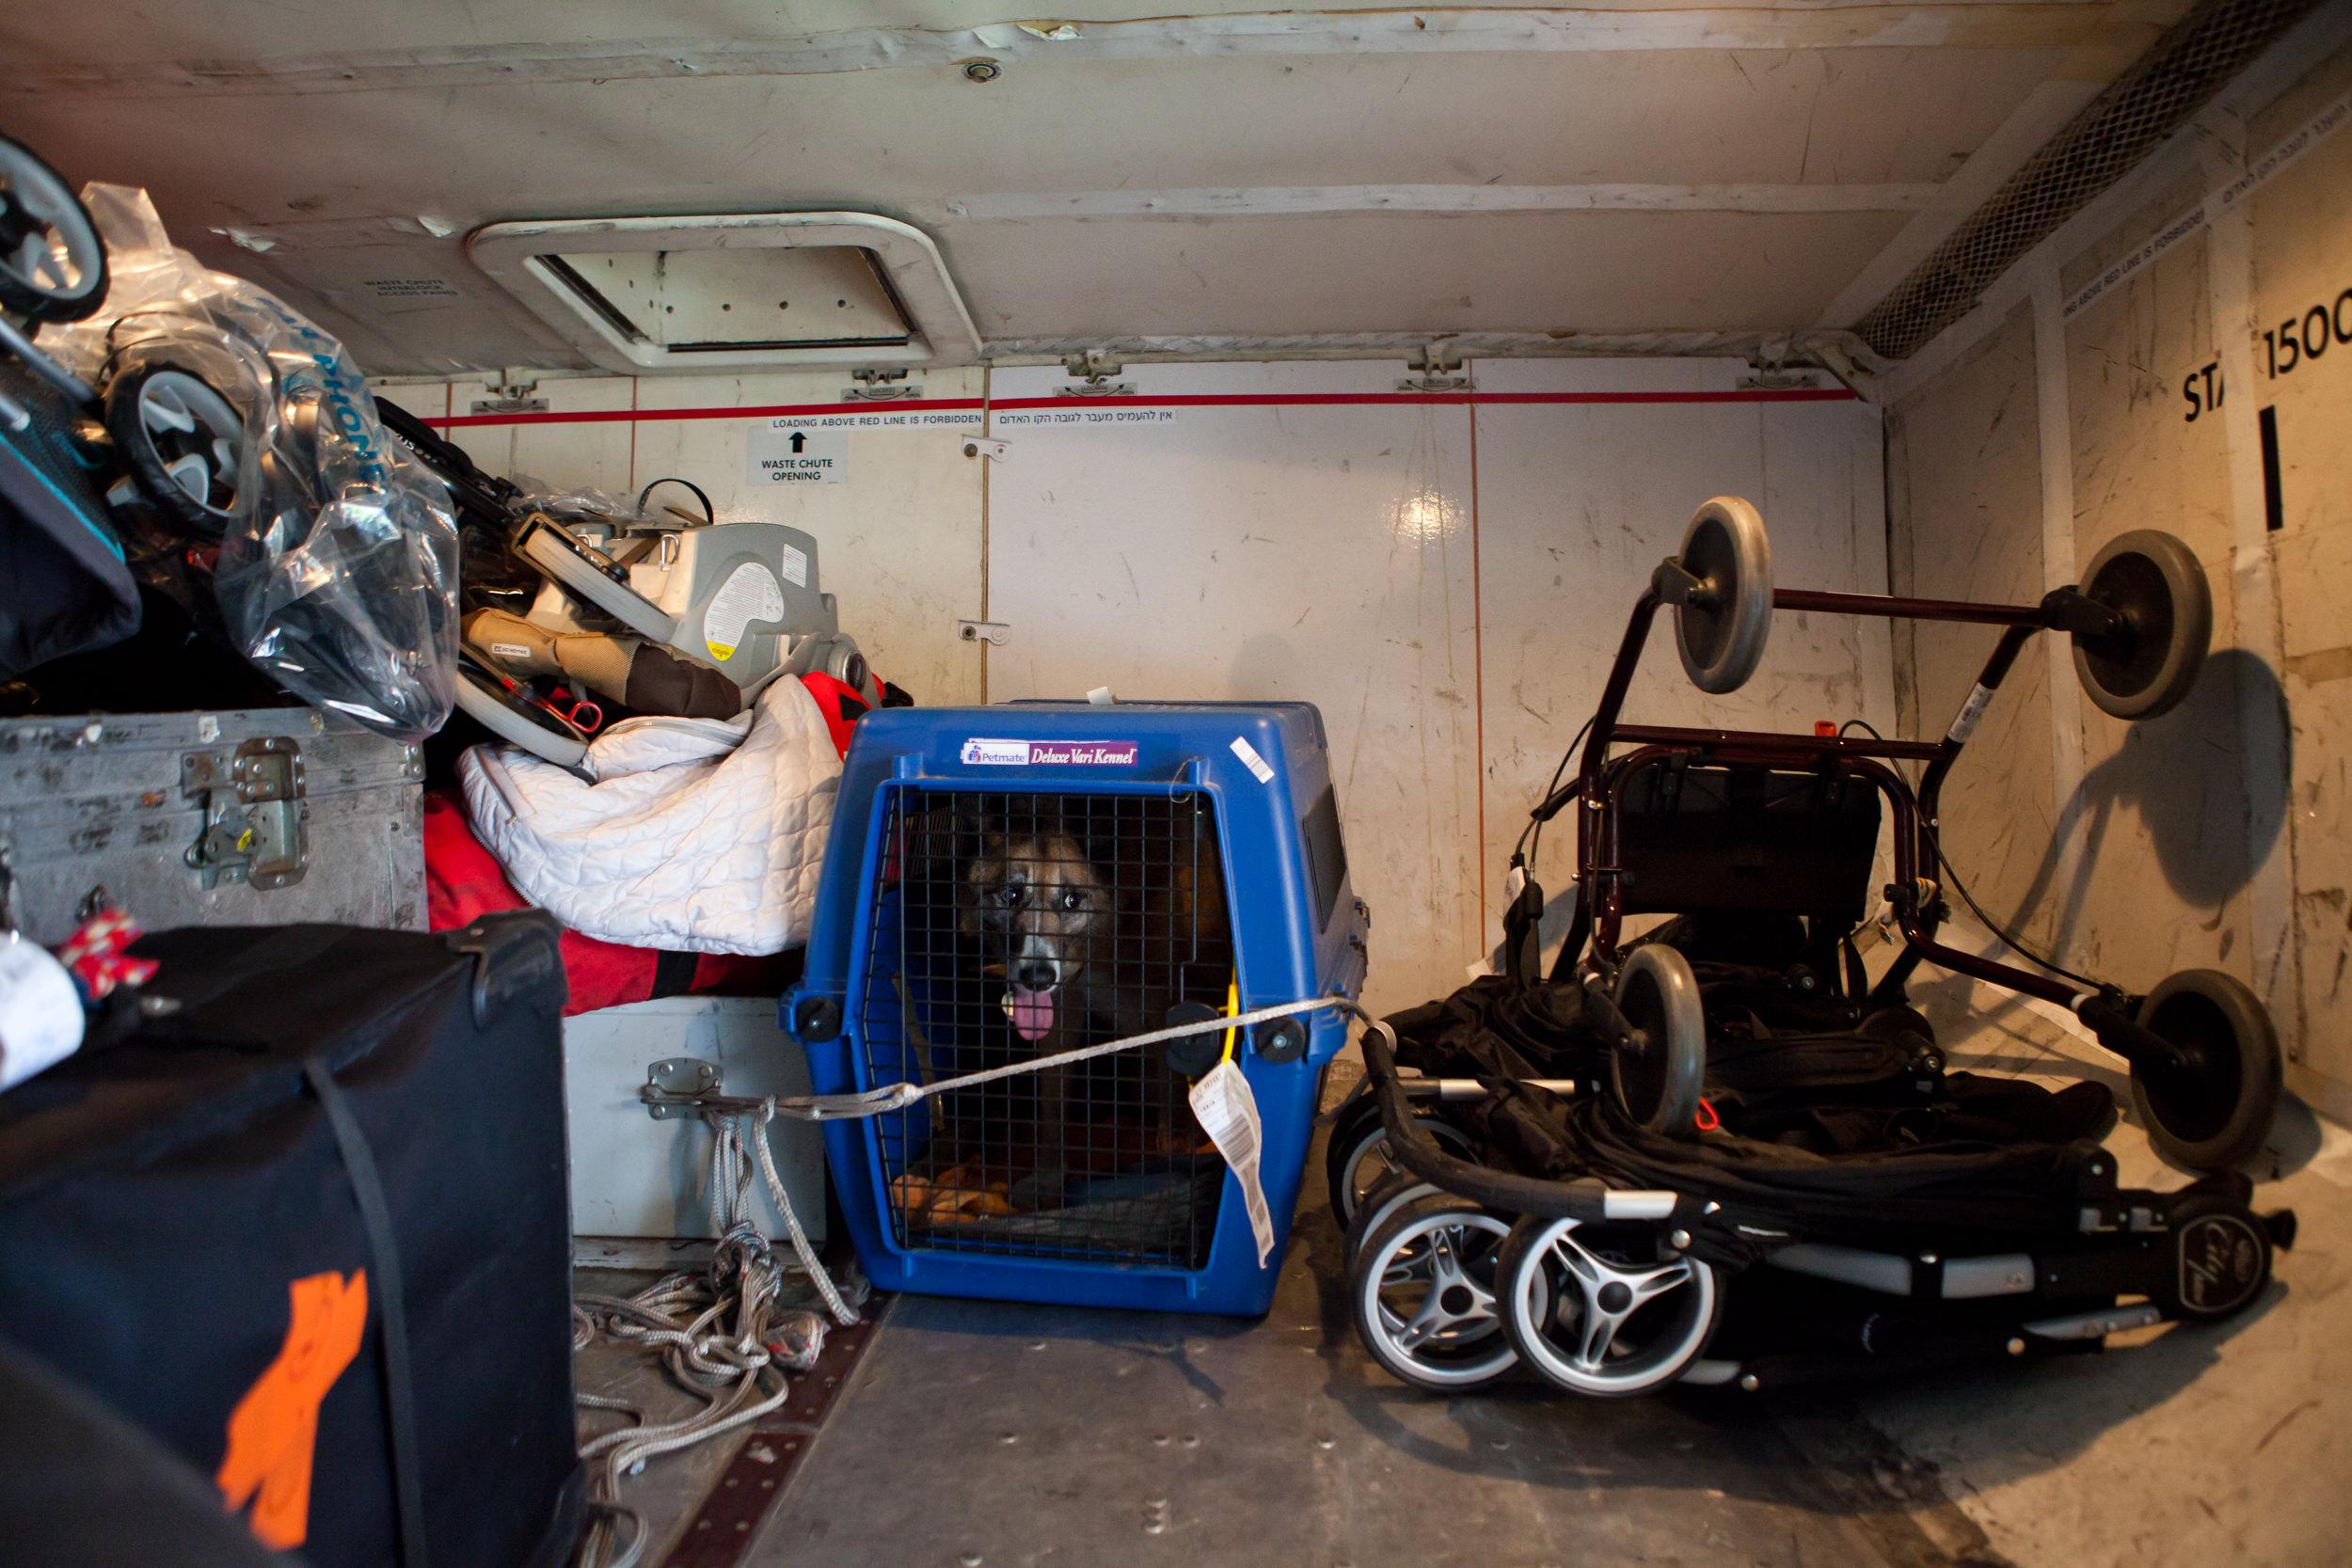 shlomi-amiga-dogs-in-cages-11.jpg